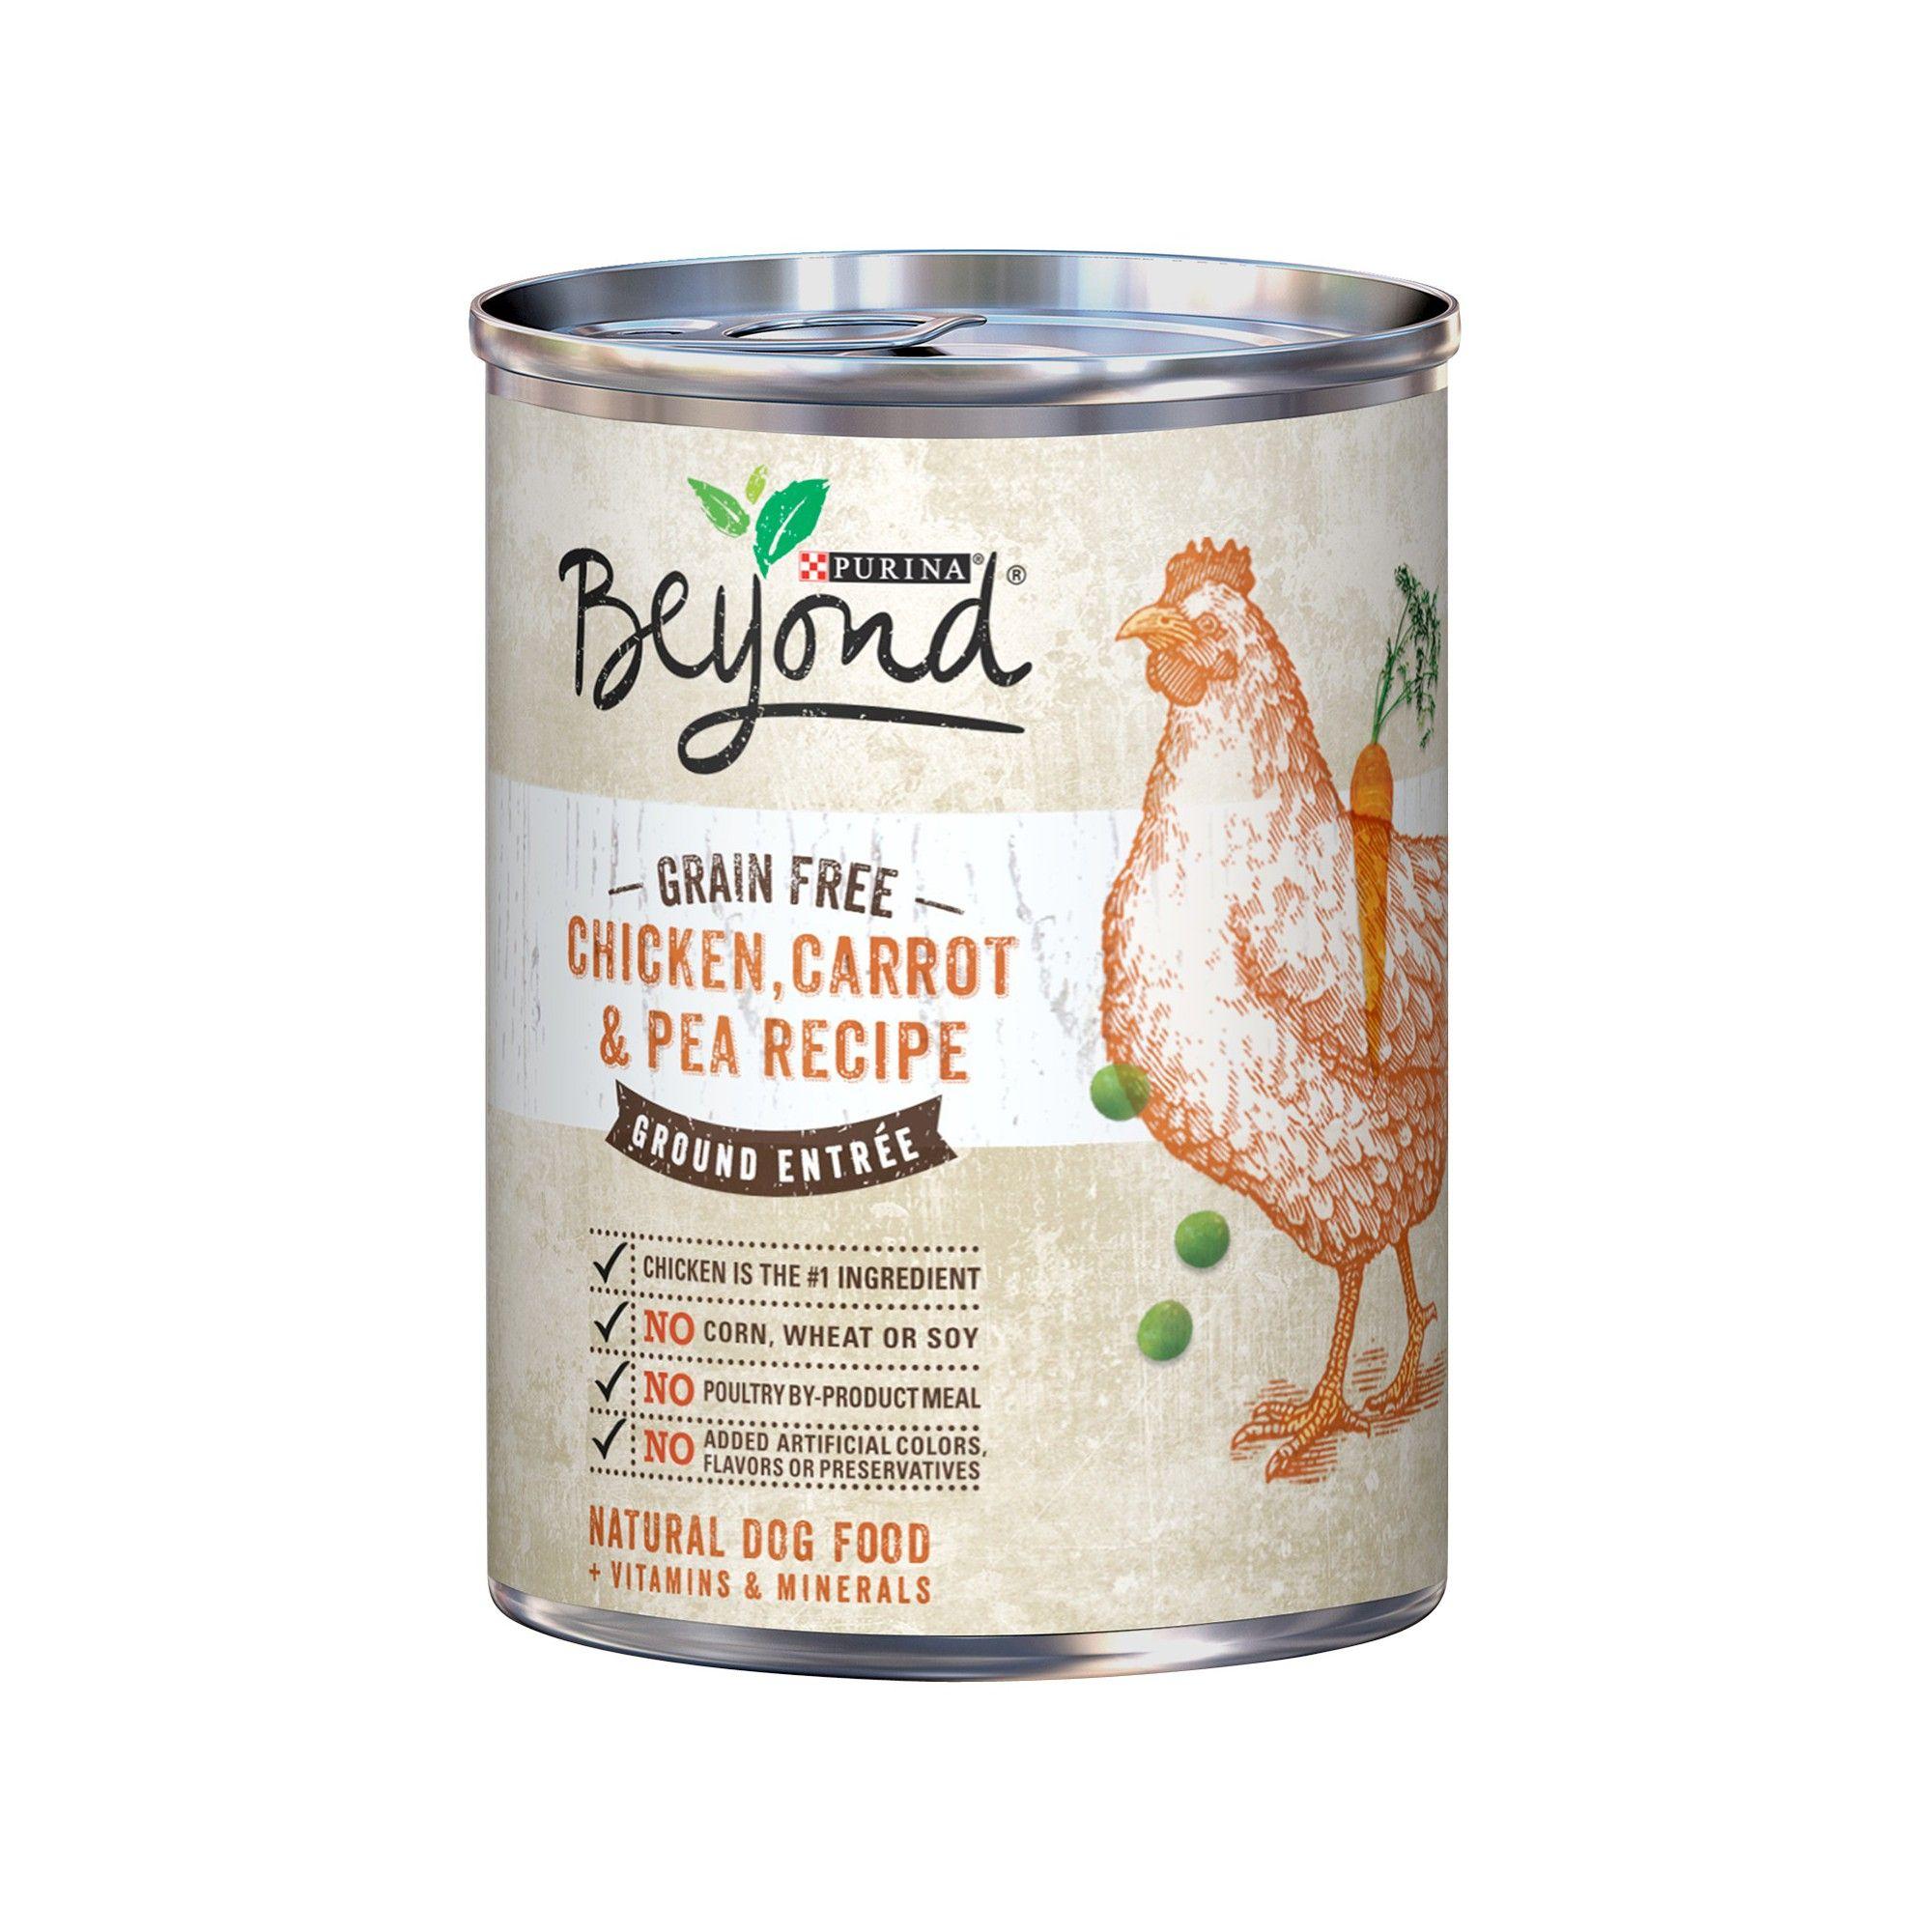 Beyond Grain Free Chicken Carrot Pea Wet Dog Food 13oz